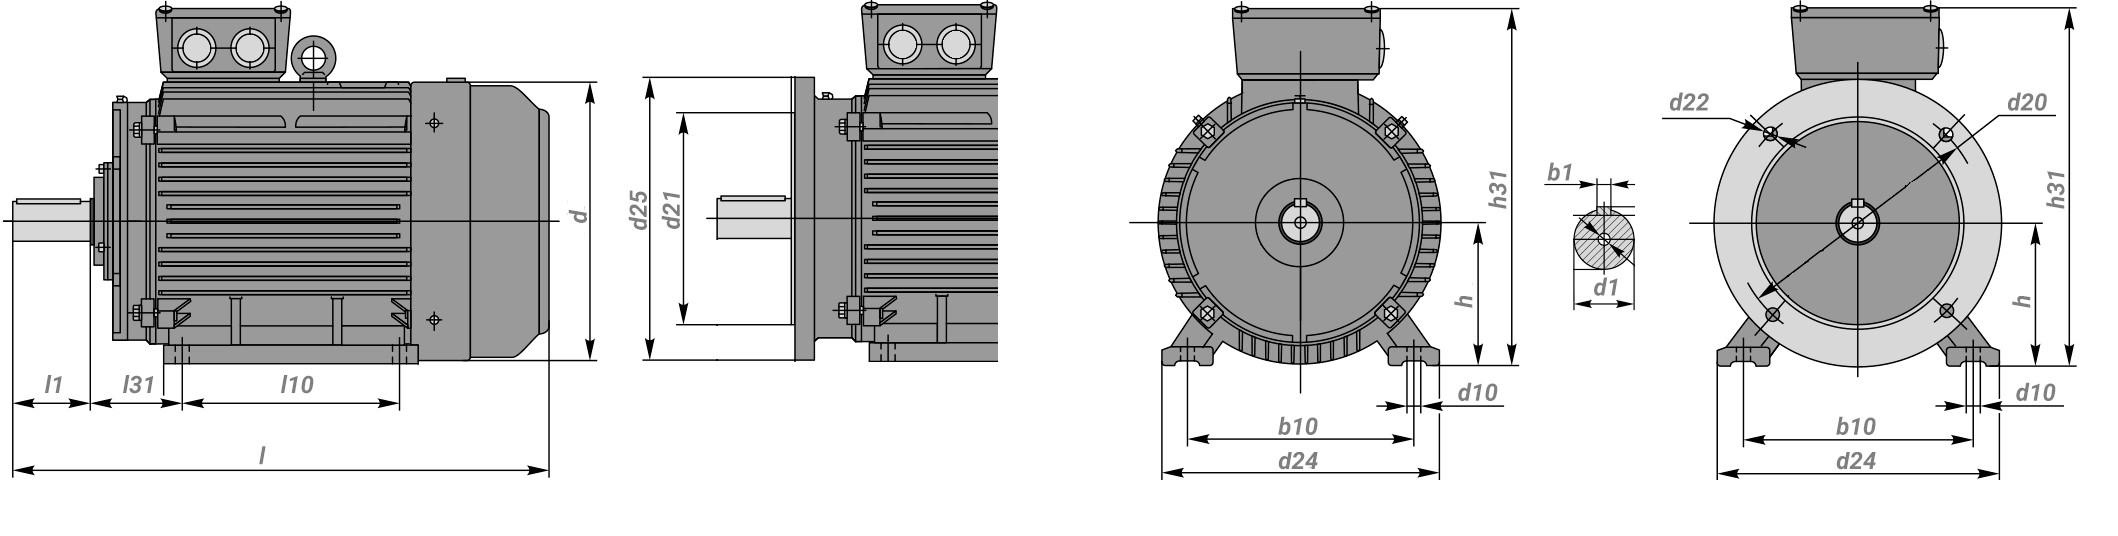 чертеж электродвигателя серии адм